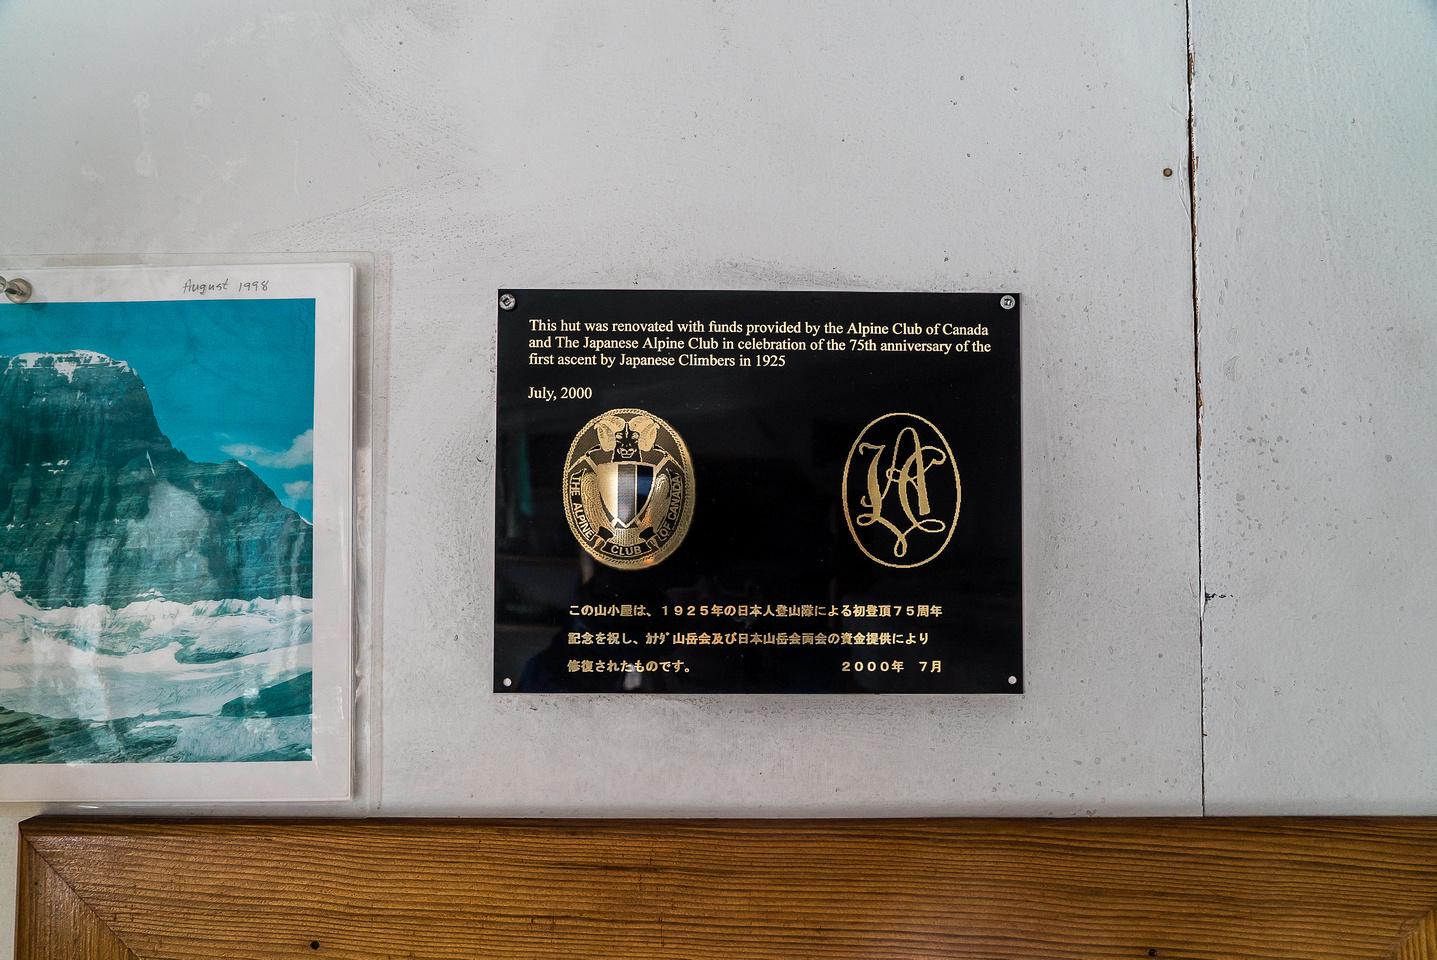 Interesting plaque in the hut.